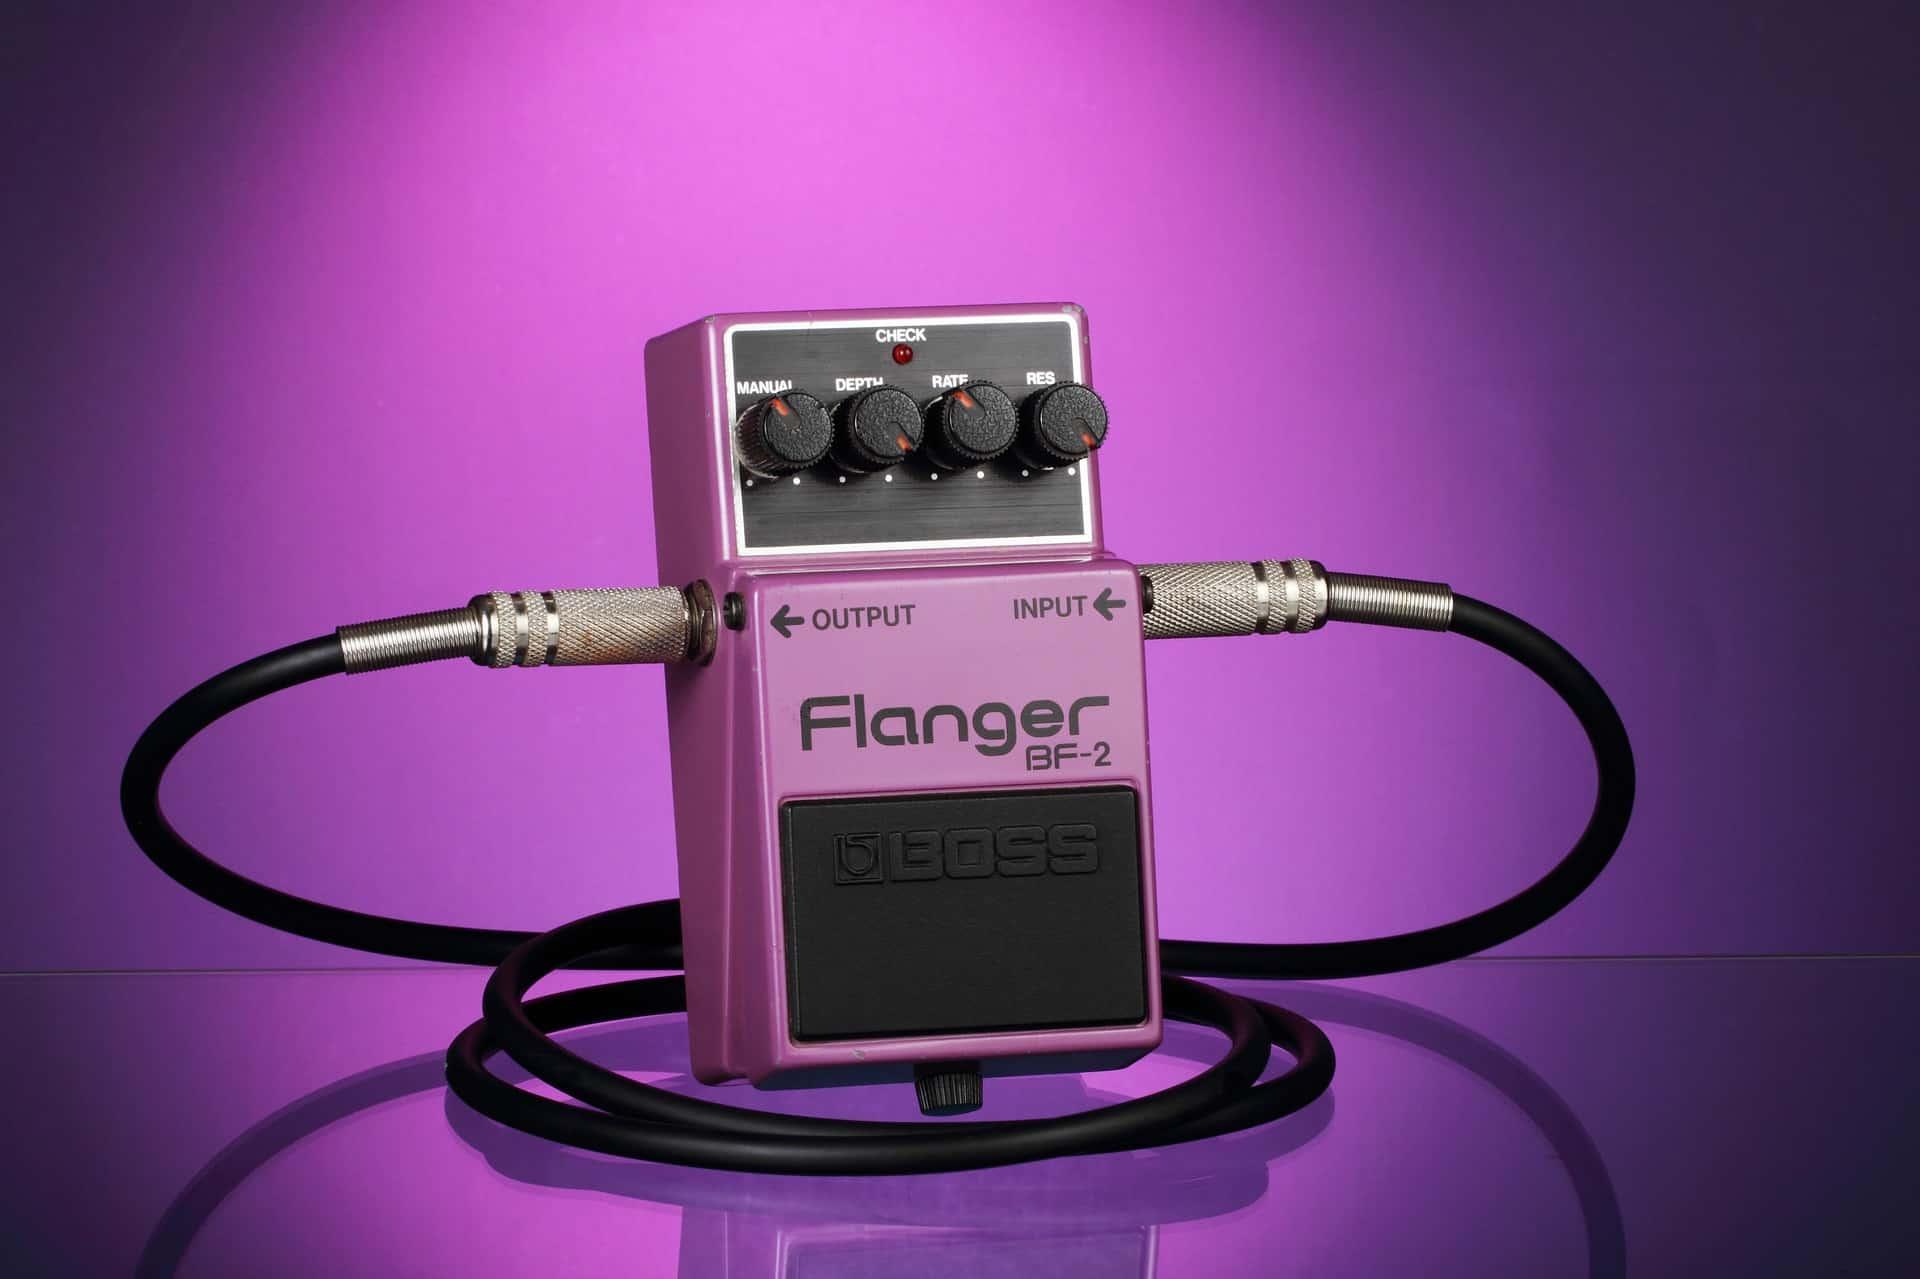 Guitar Flanger Pedal